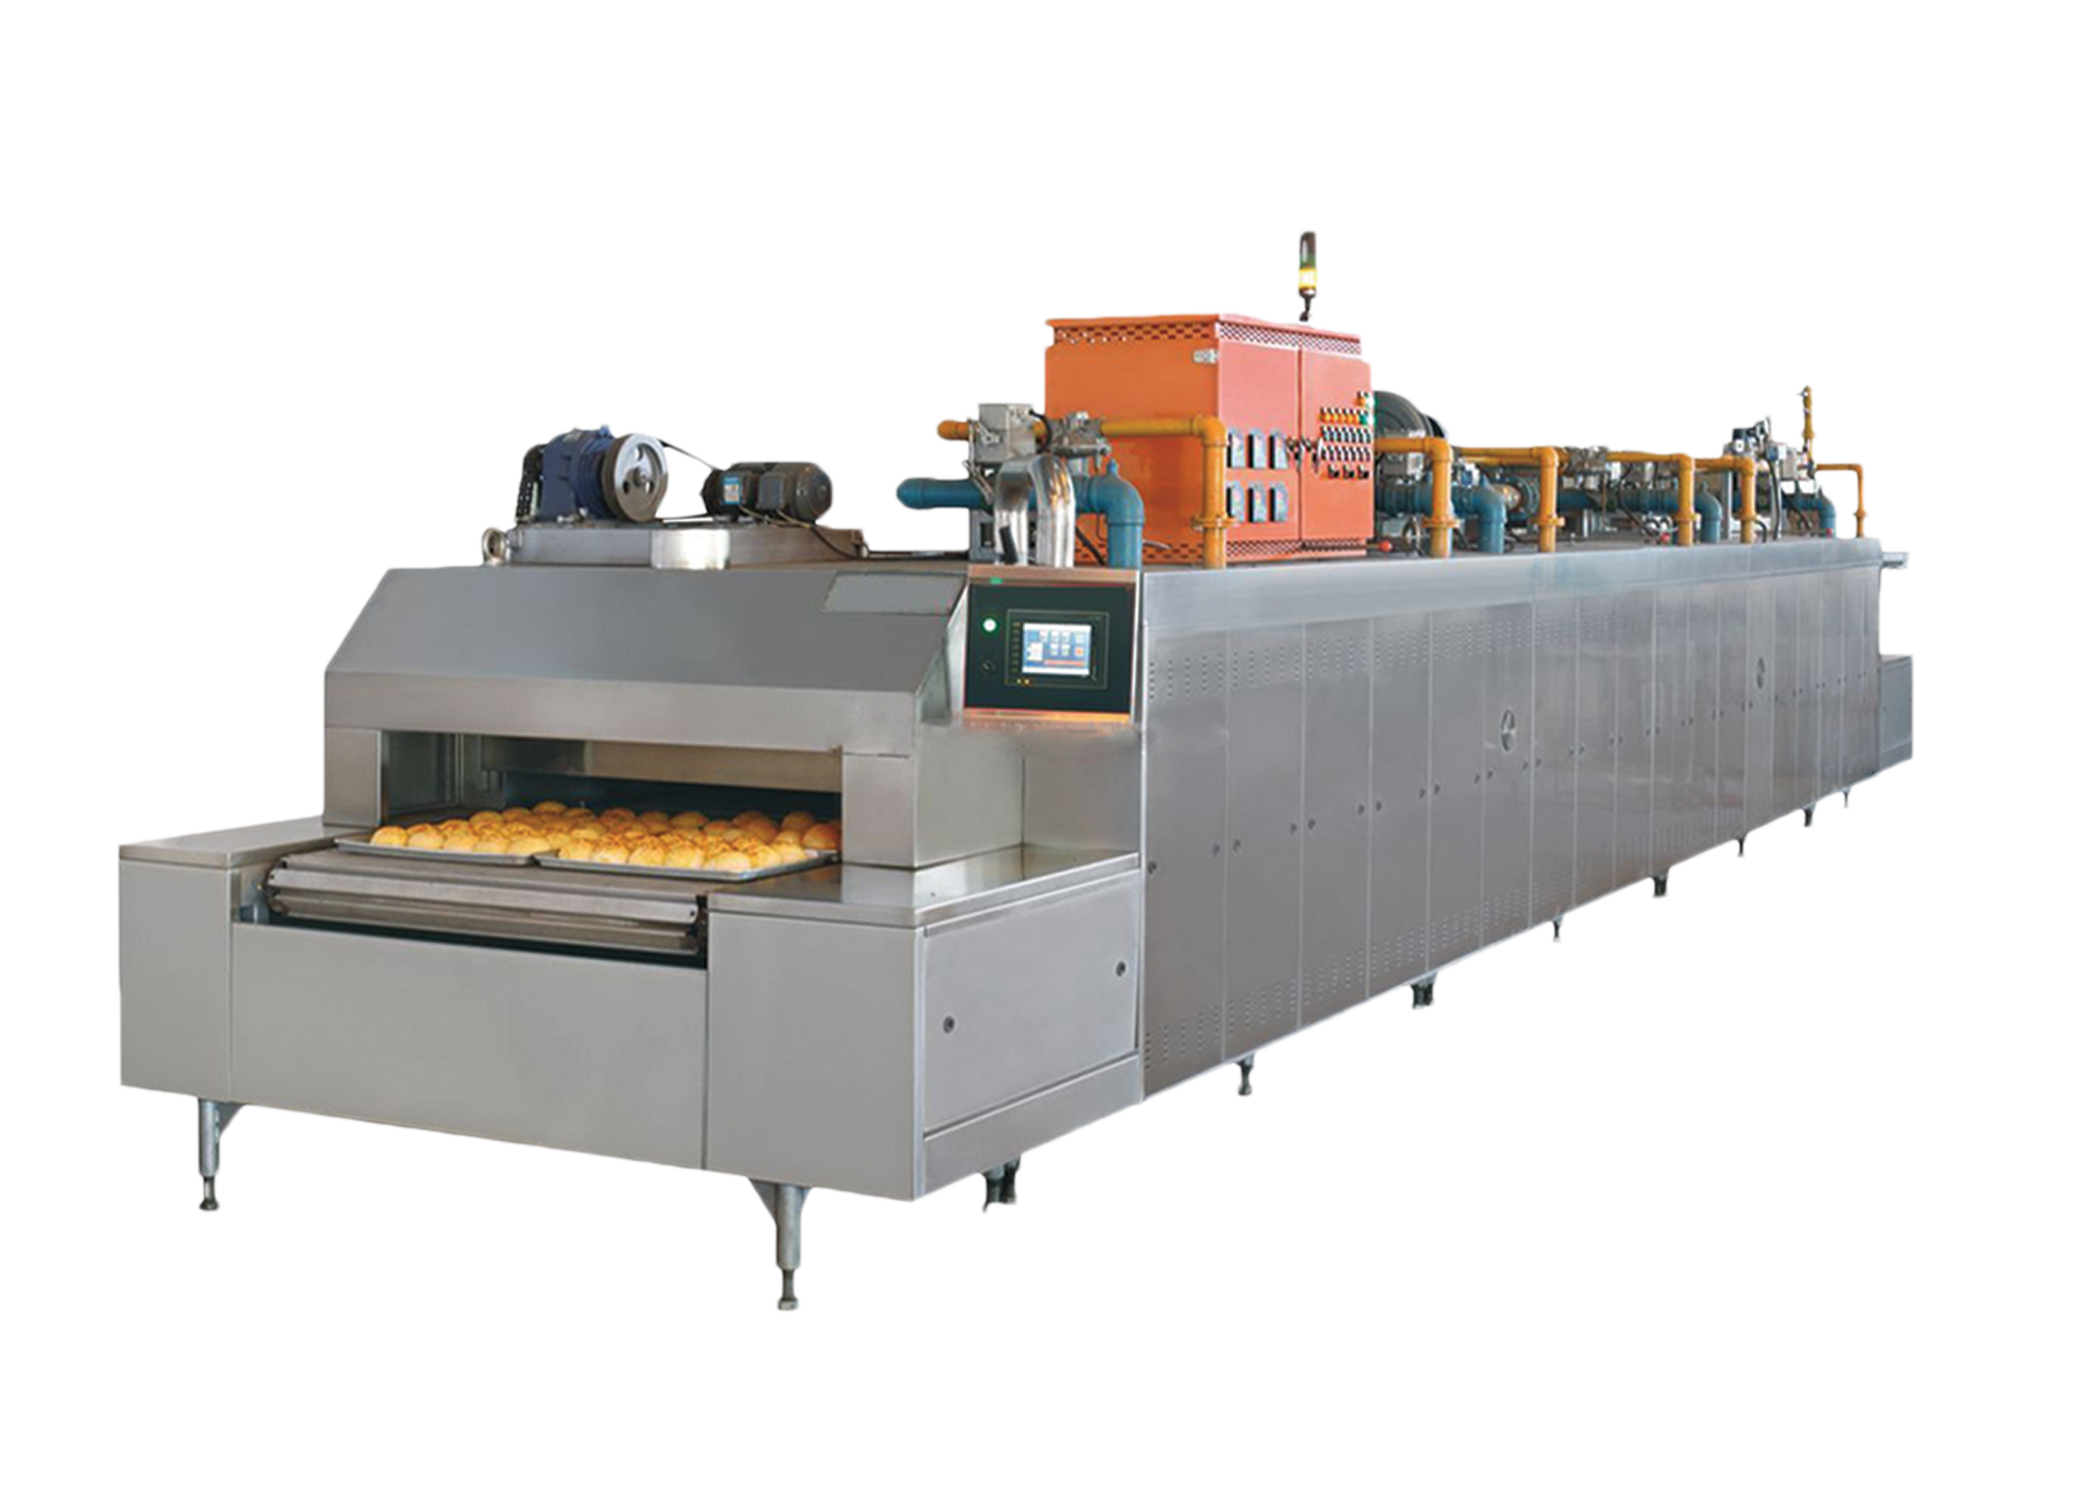 Oven Calibration